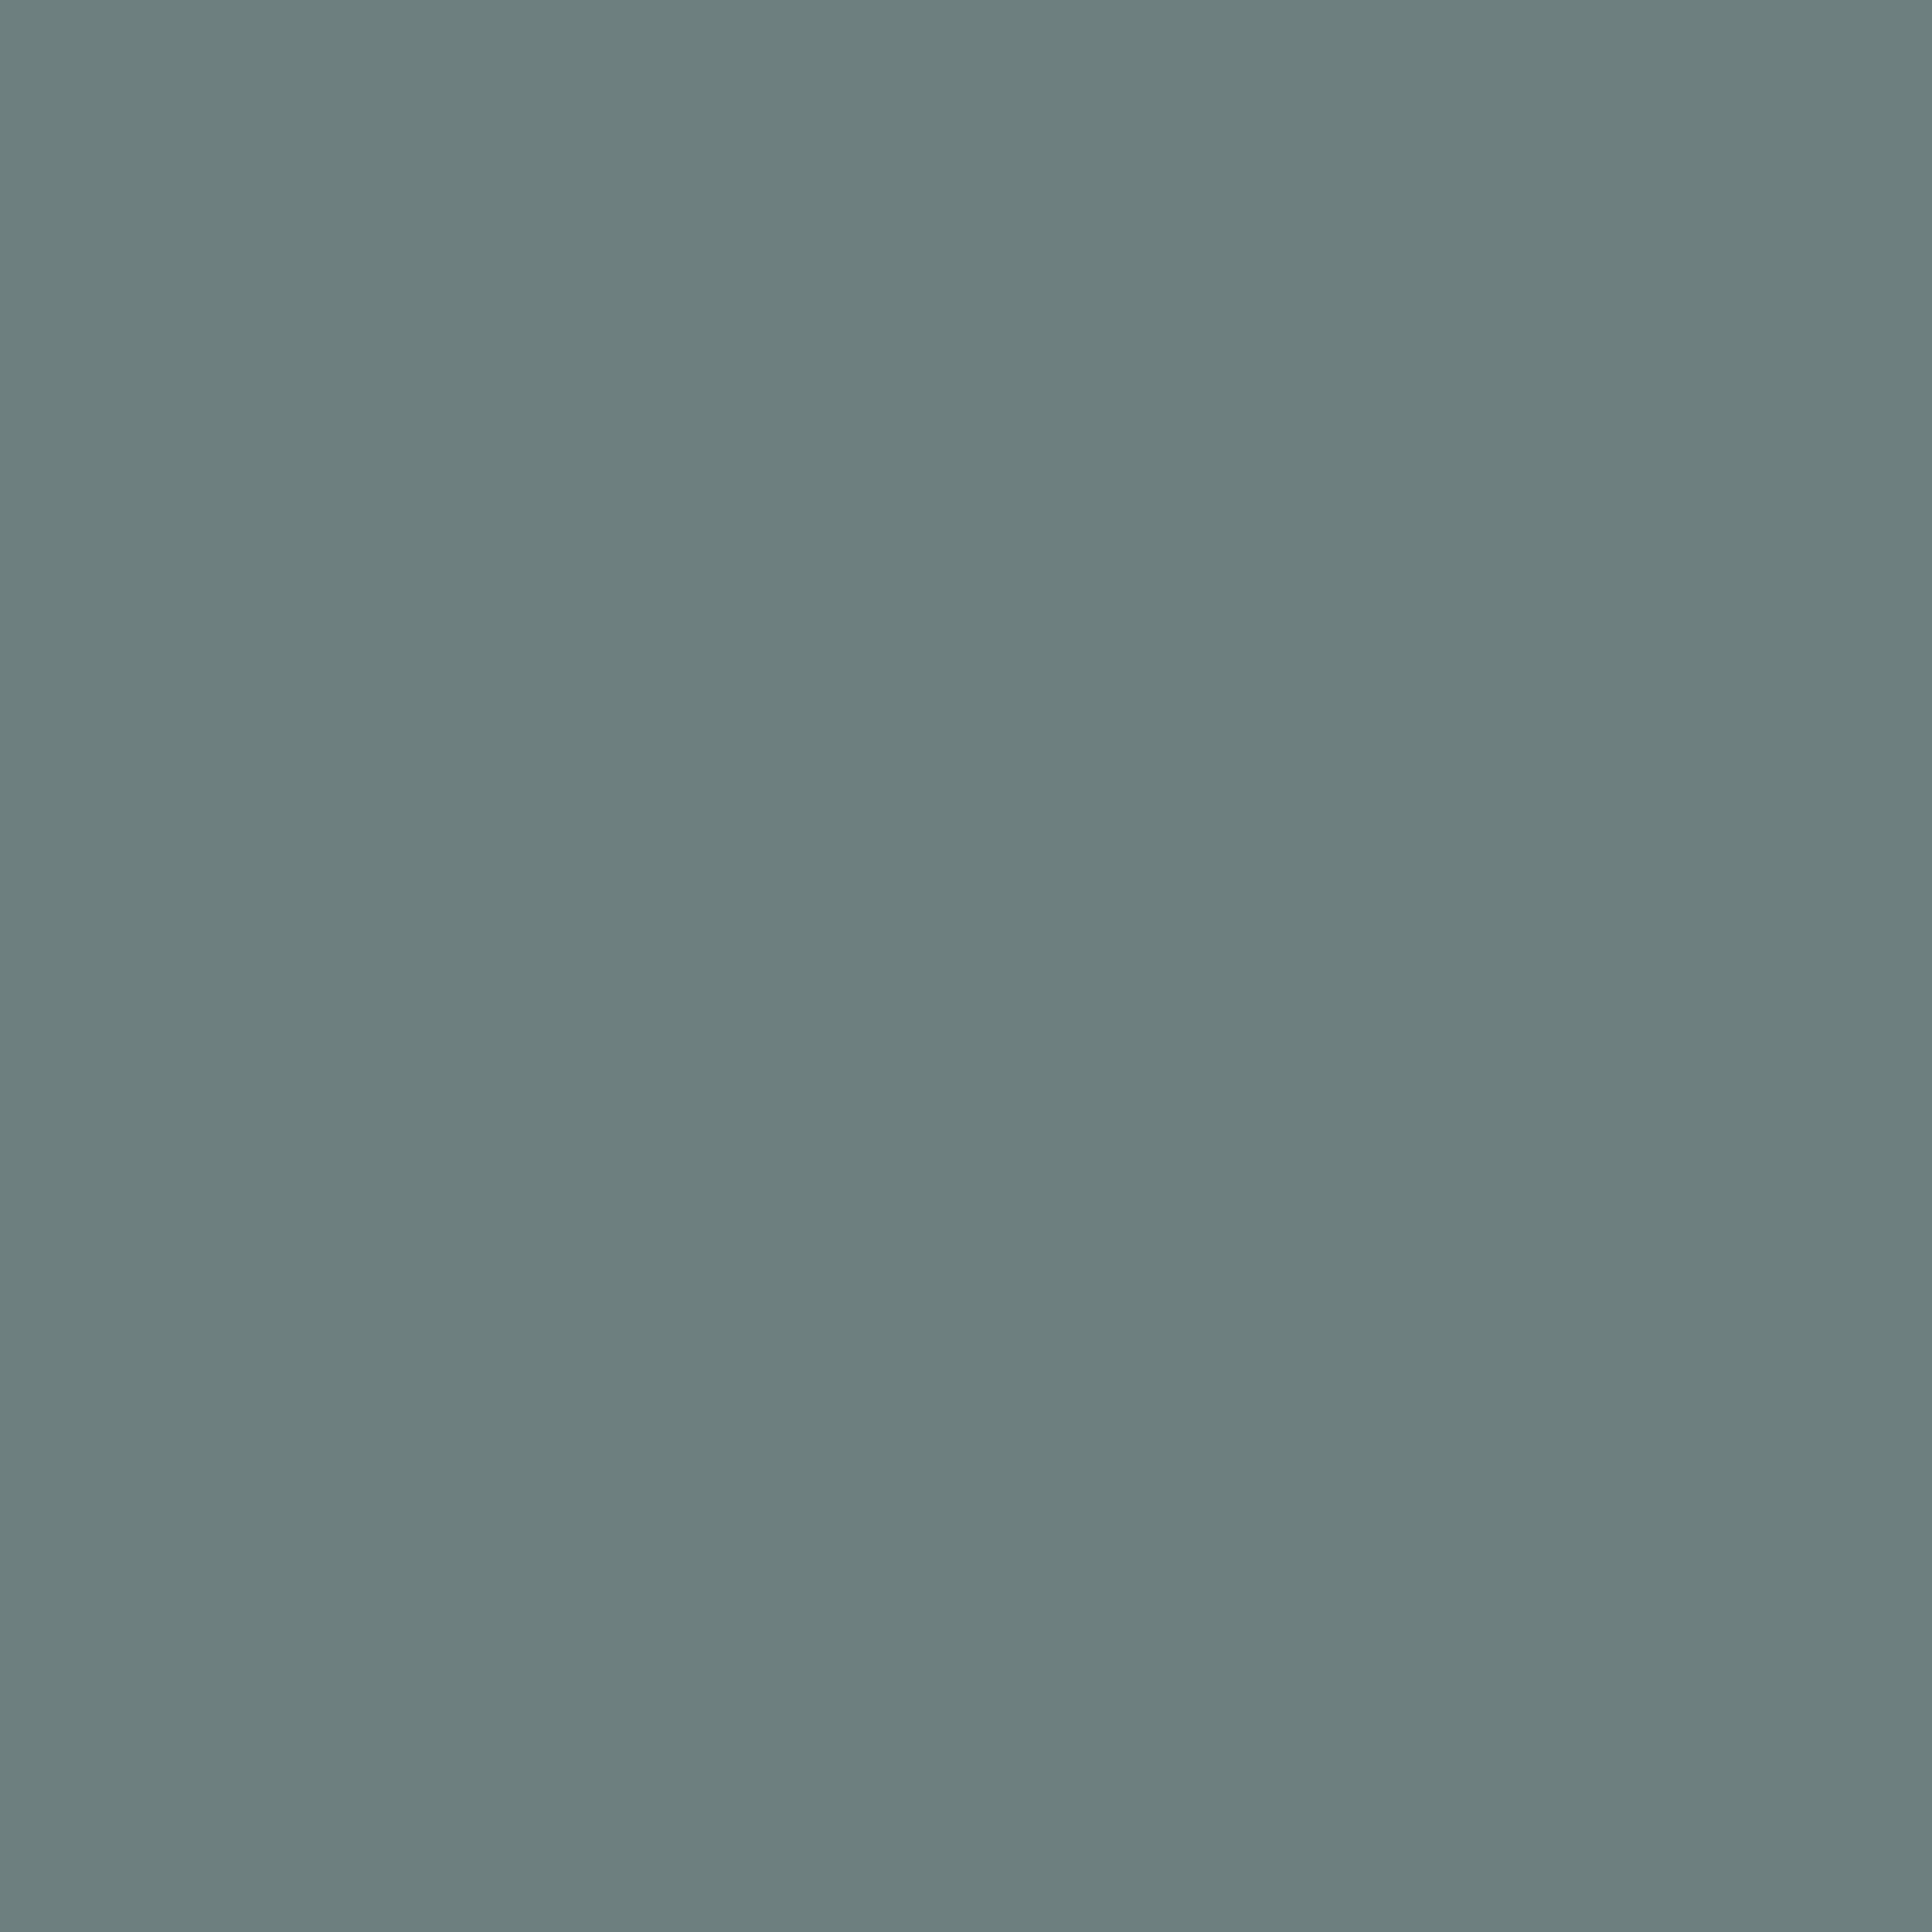 2048x2048 AuroMetalSaurus Solid Color Background